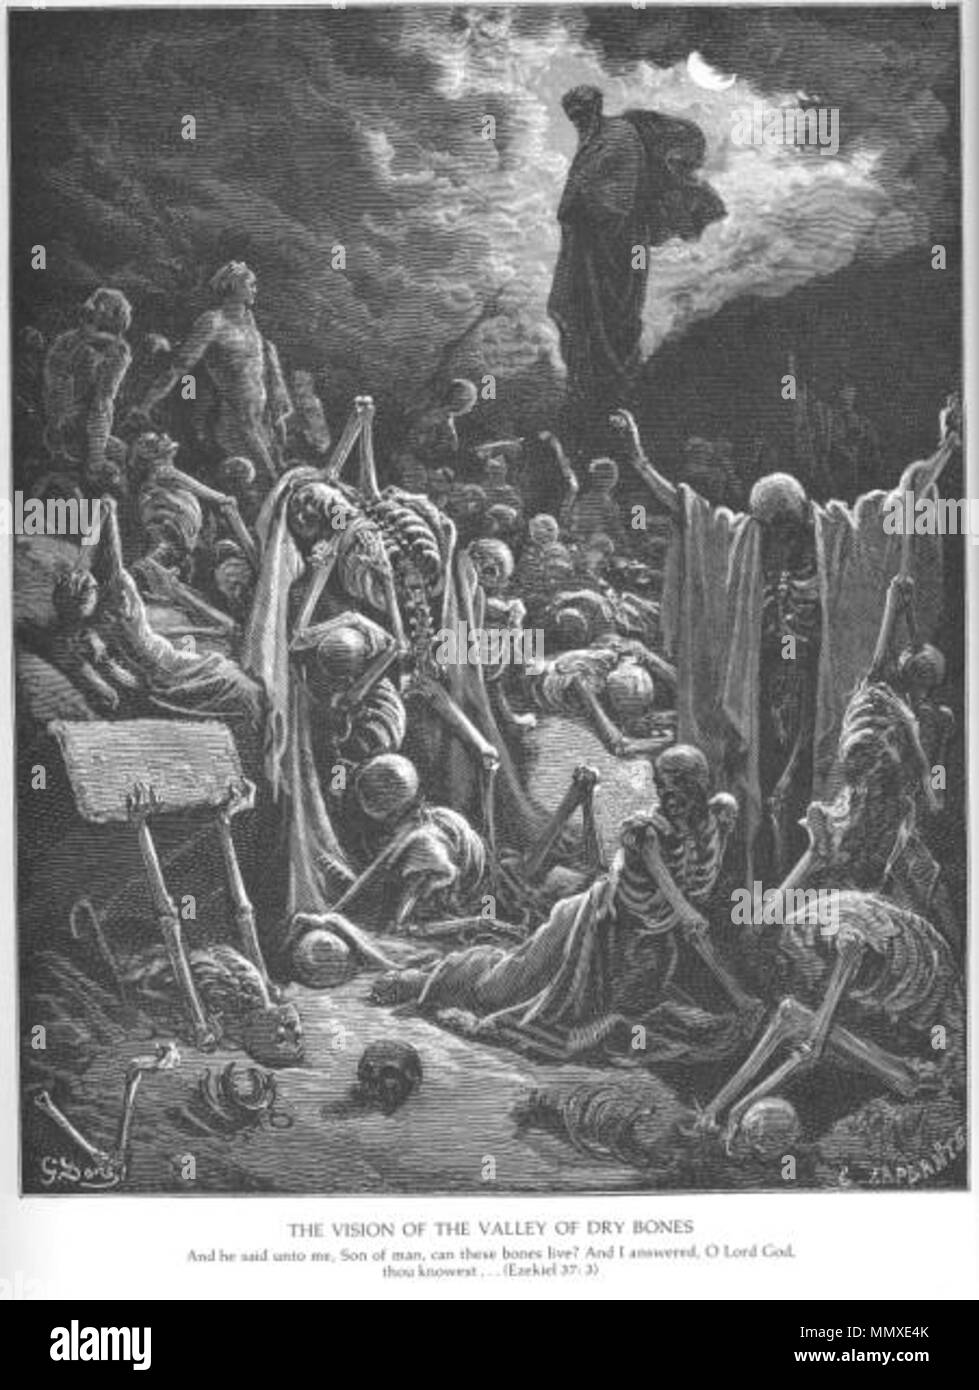 Ezekiel's Vision of the Valley of Dry Bones - Stock Image